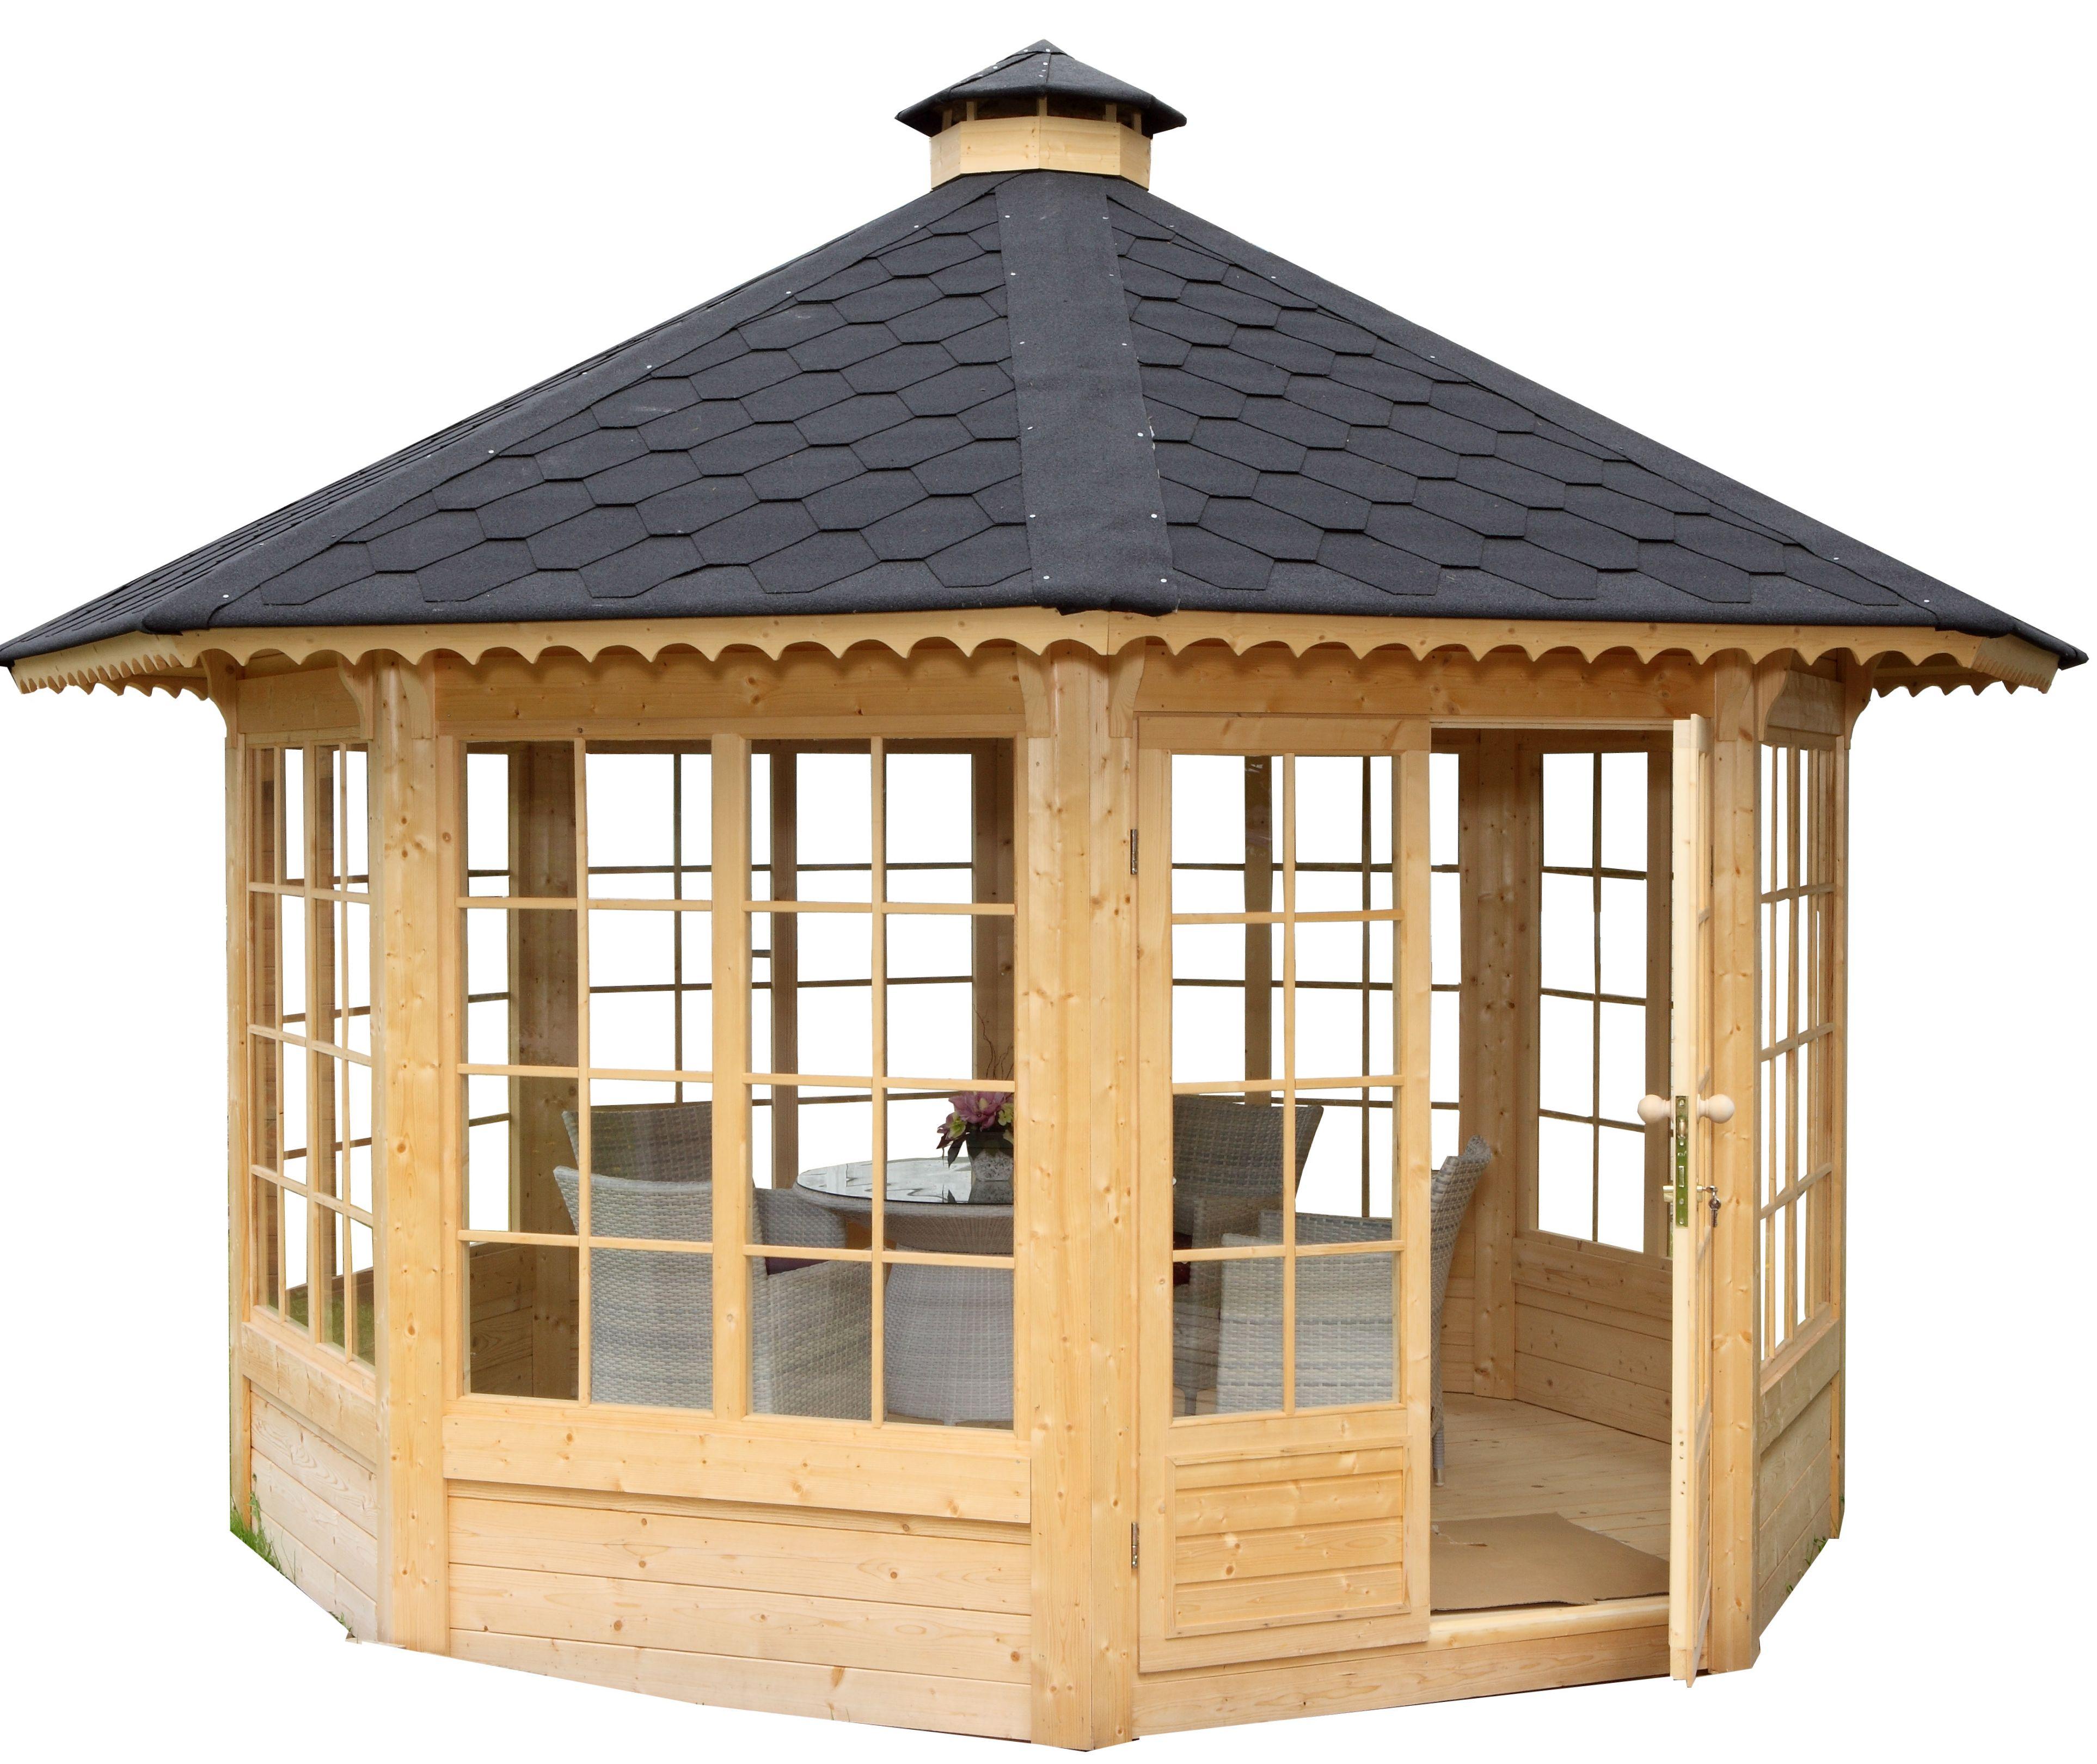 Gartenpavillon Holz Mit Stoffdach ~ Holzpavillon mit Fenster